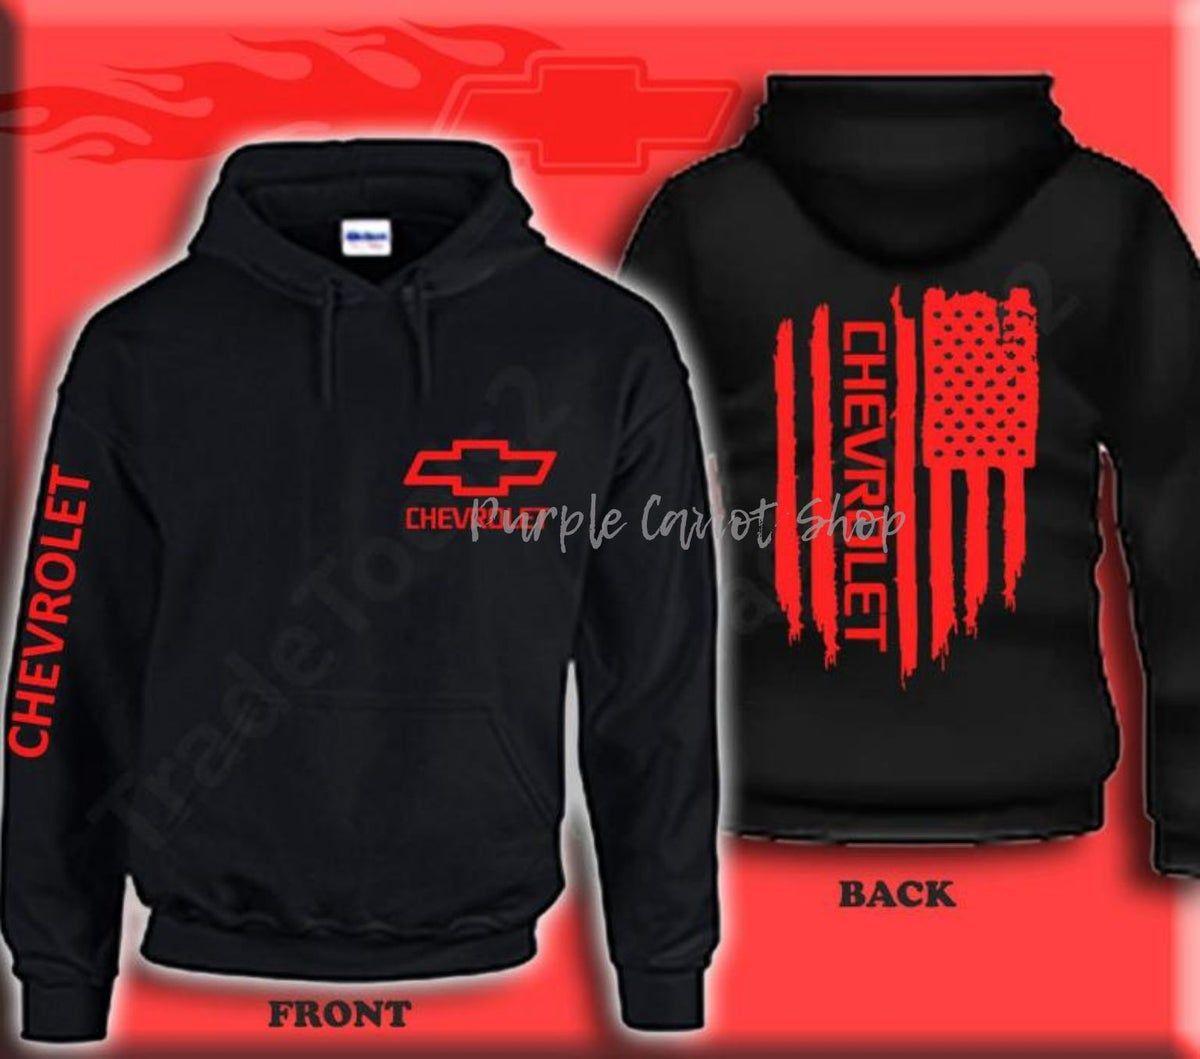 Chevrolet Sweatshirt Xl American Flag Sweatshirts Chevy Truck Shirts Country Sweatshirts [ 1059 x 1200 Pixel ]